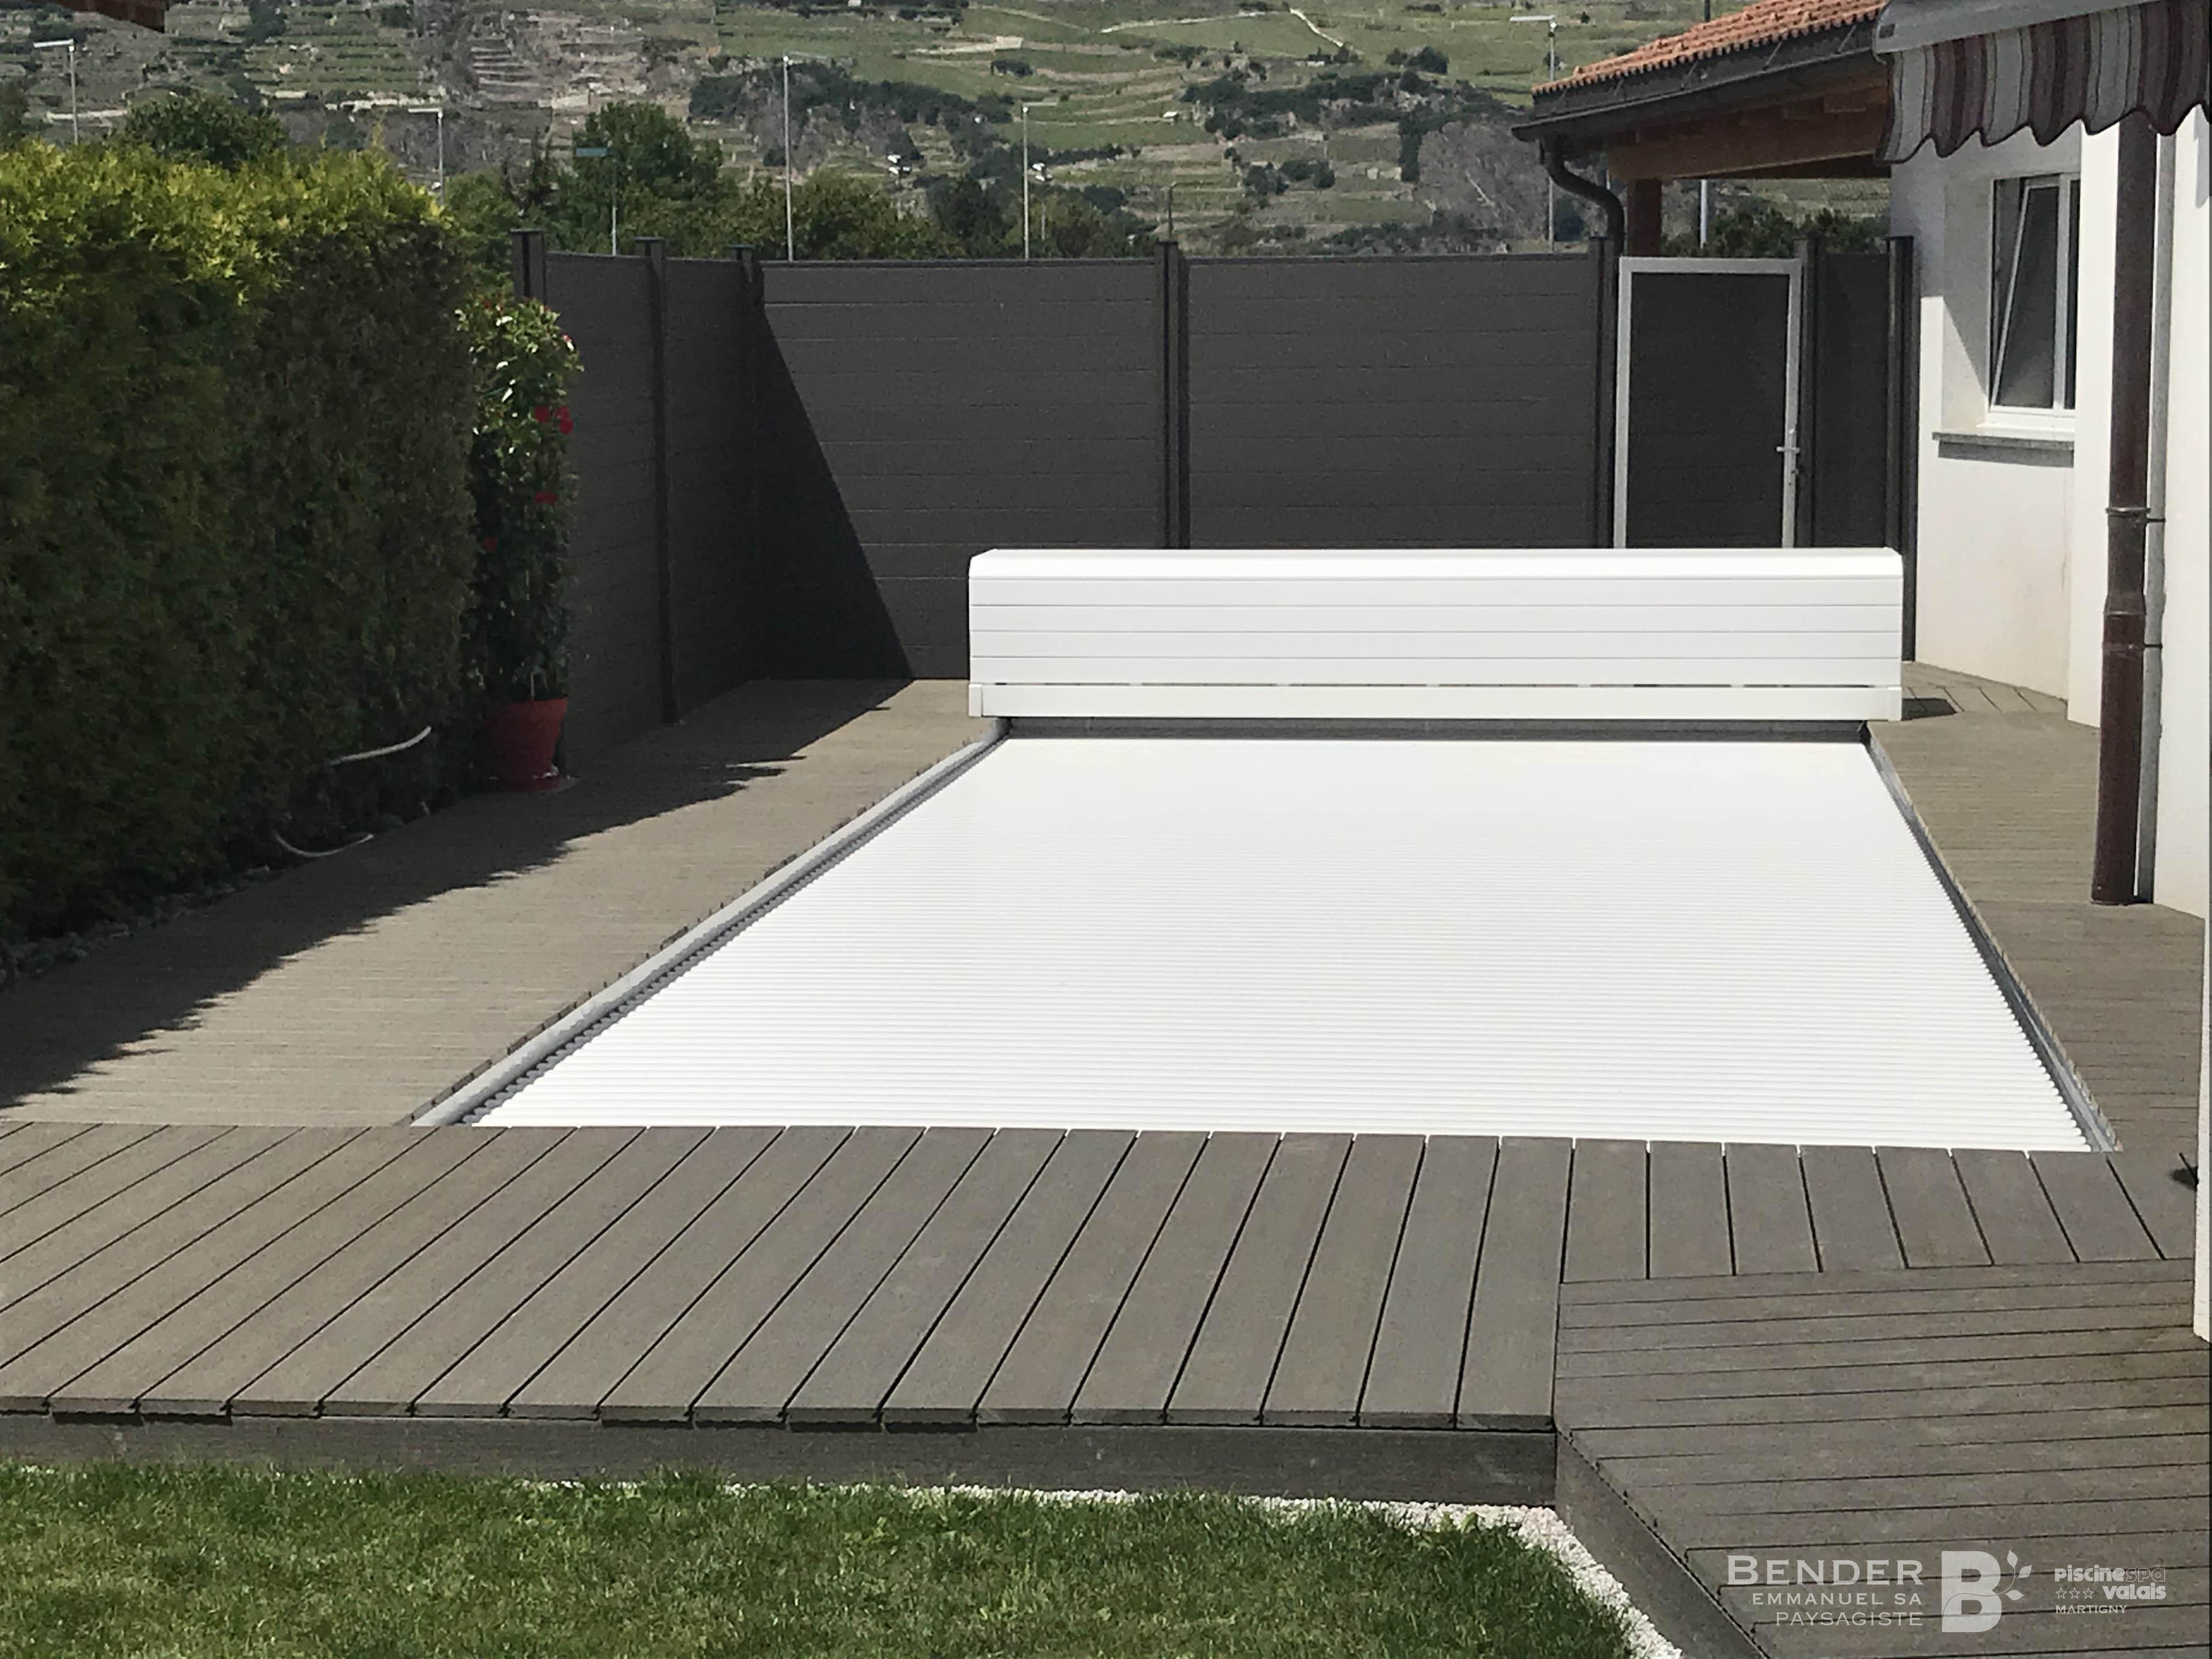 Polyfaser piscine piscine piscine monoblocco a treviso for Mirani piscine